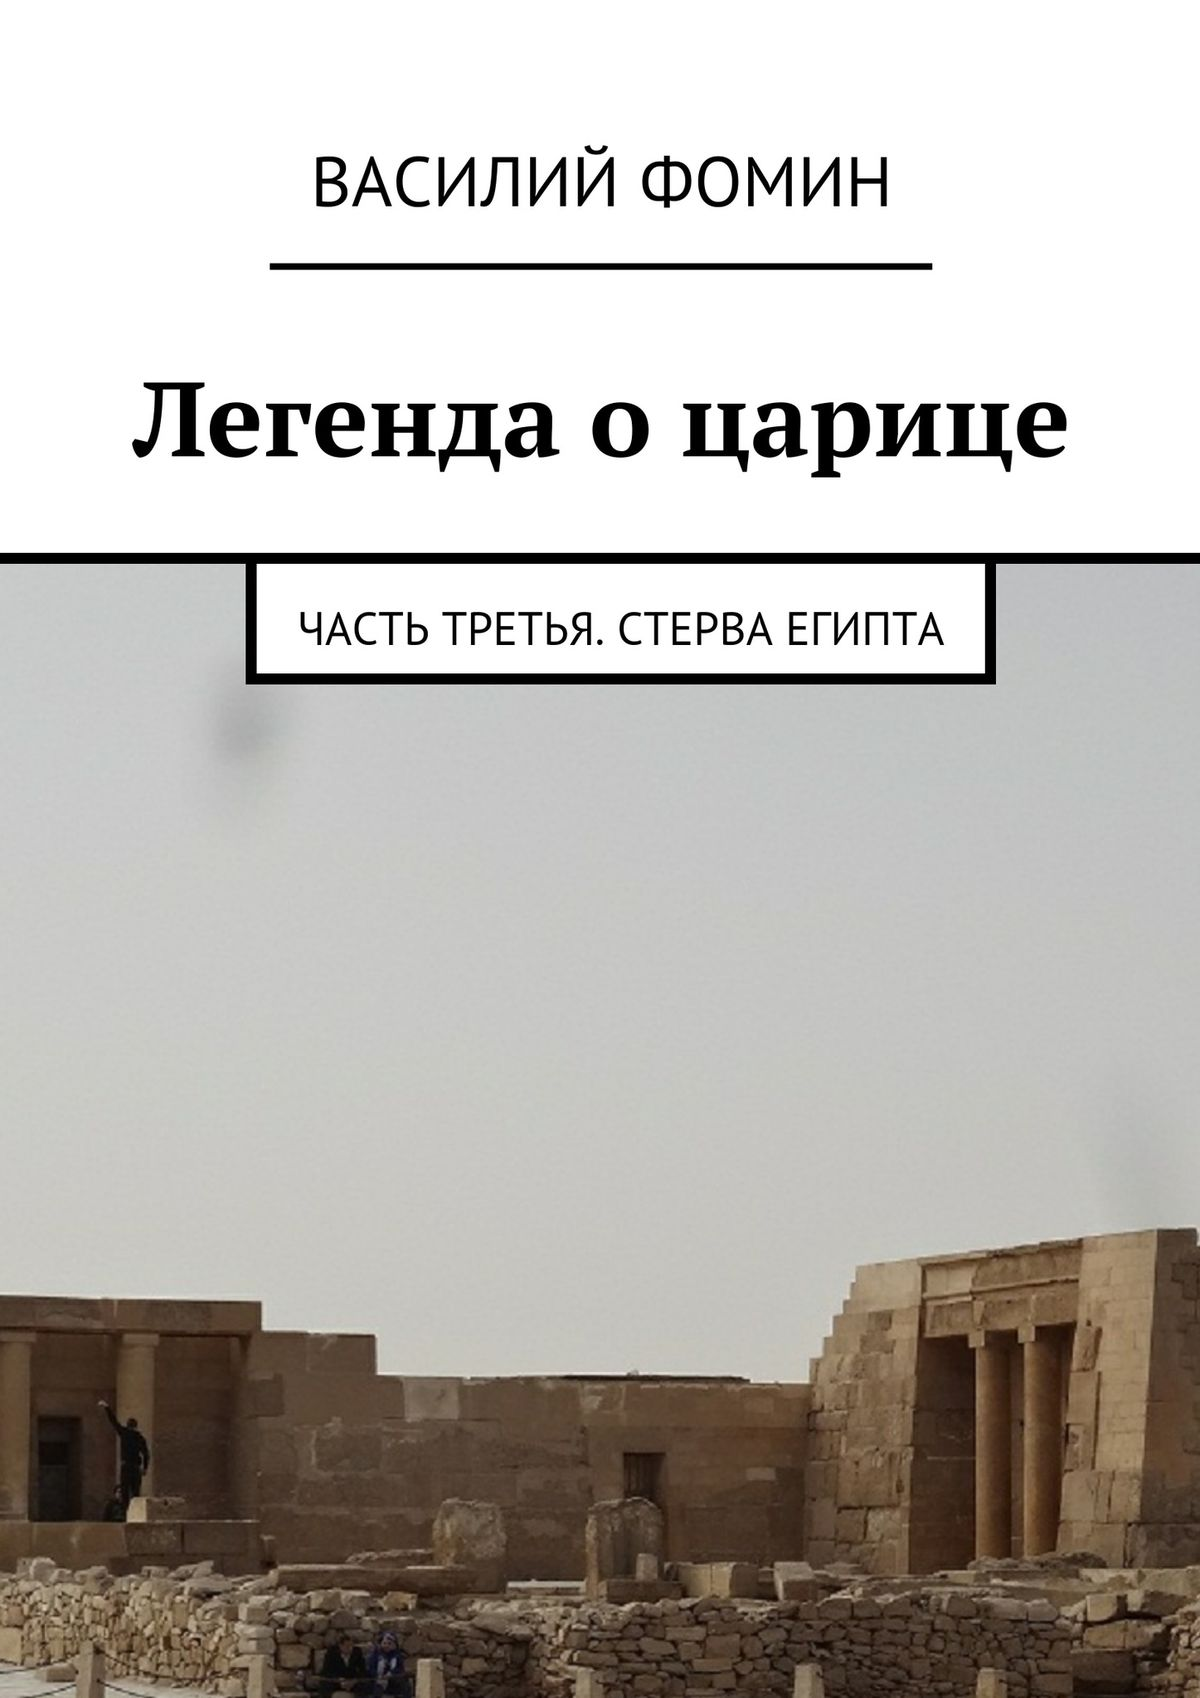 Василий Фомин Легенда о царице. Часть третья. Стерва Египта